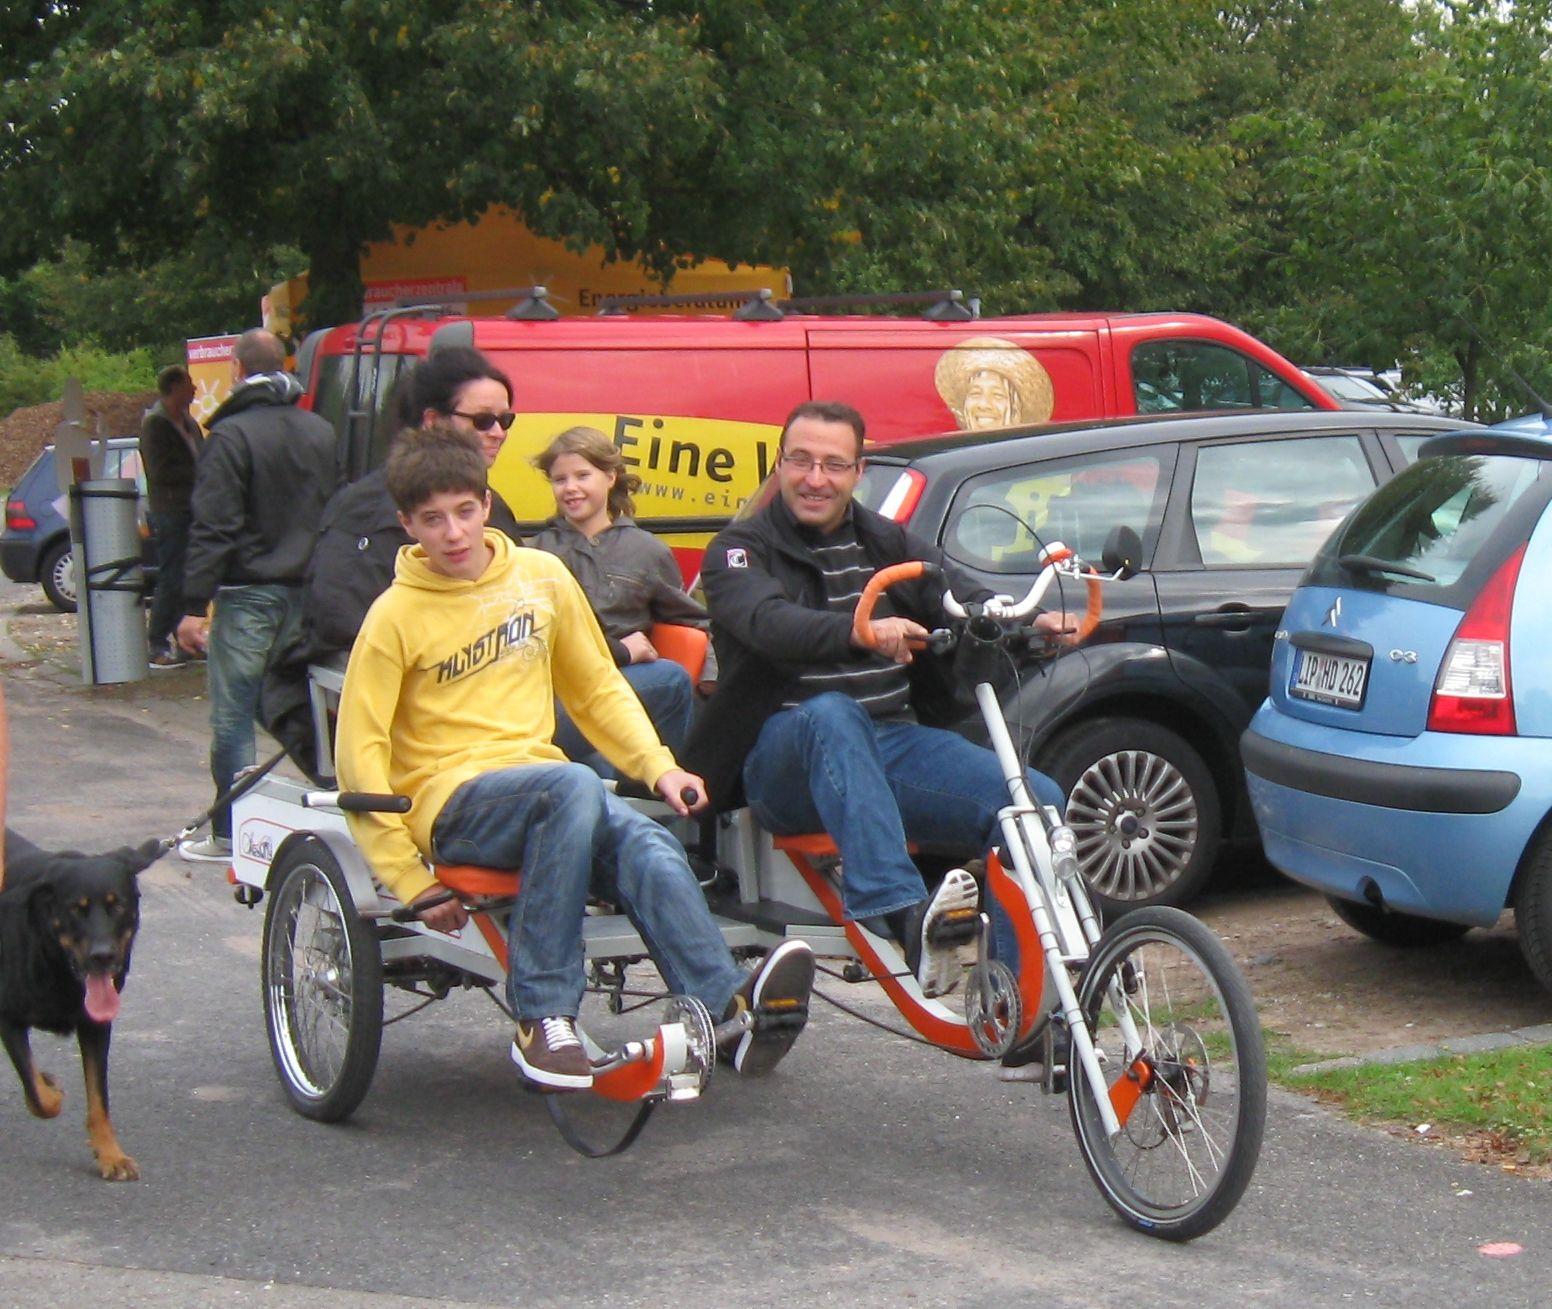 Fahrrad Bicycle City Vehicle Family Cycle Manufaktur